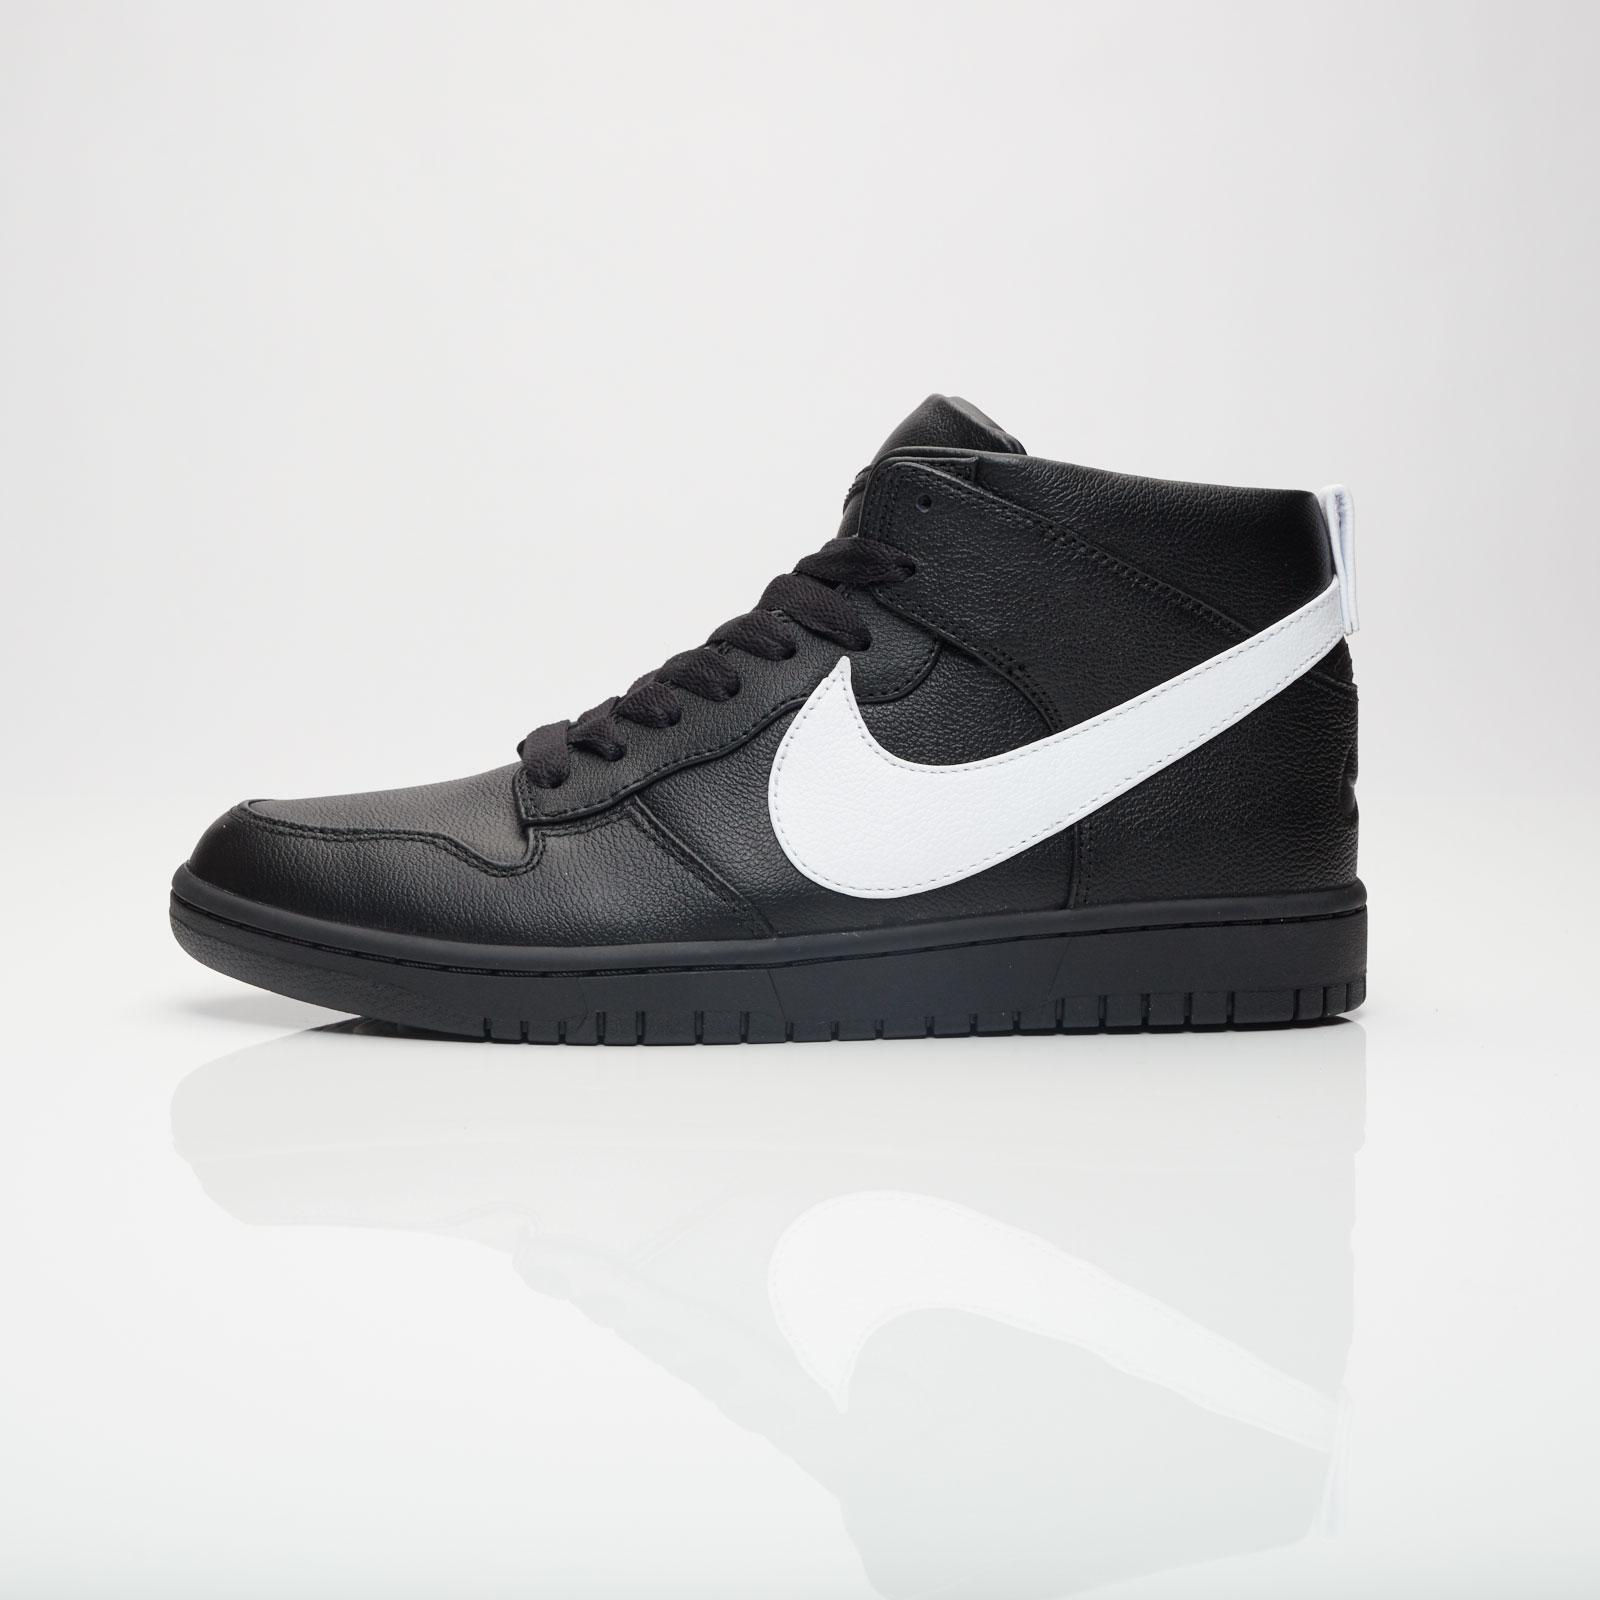 8cac20319cc7 Nike Dunk Lux Chukka   Rt - 910088-001 - Sneakersnstuff